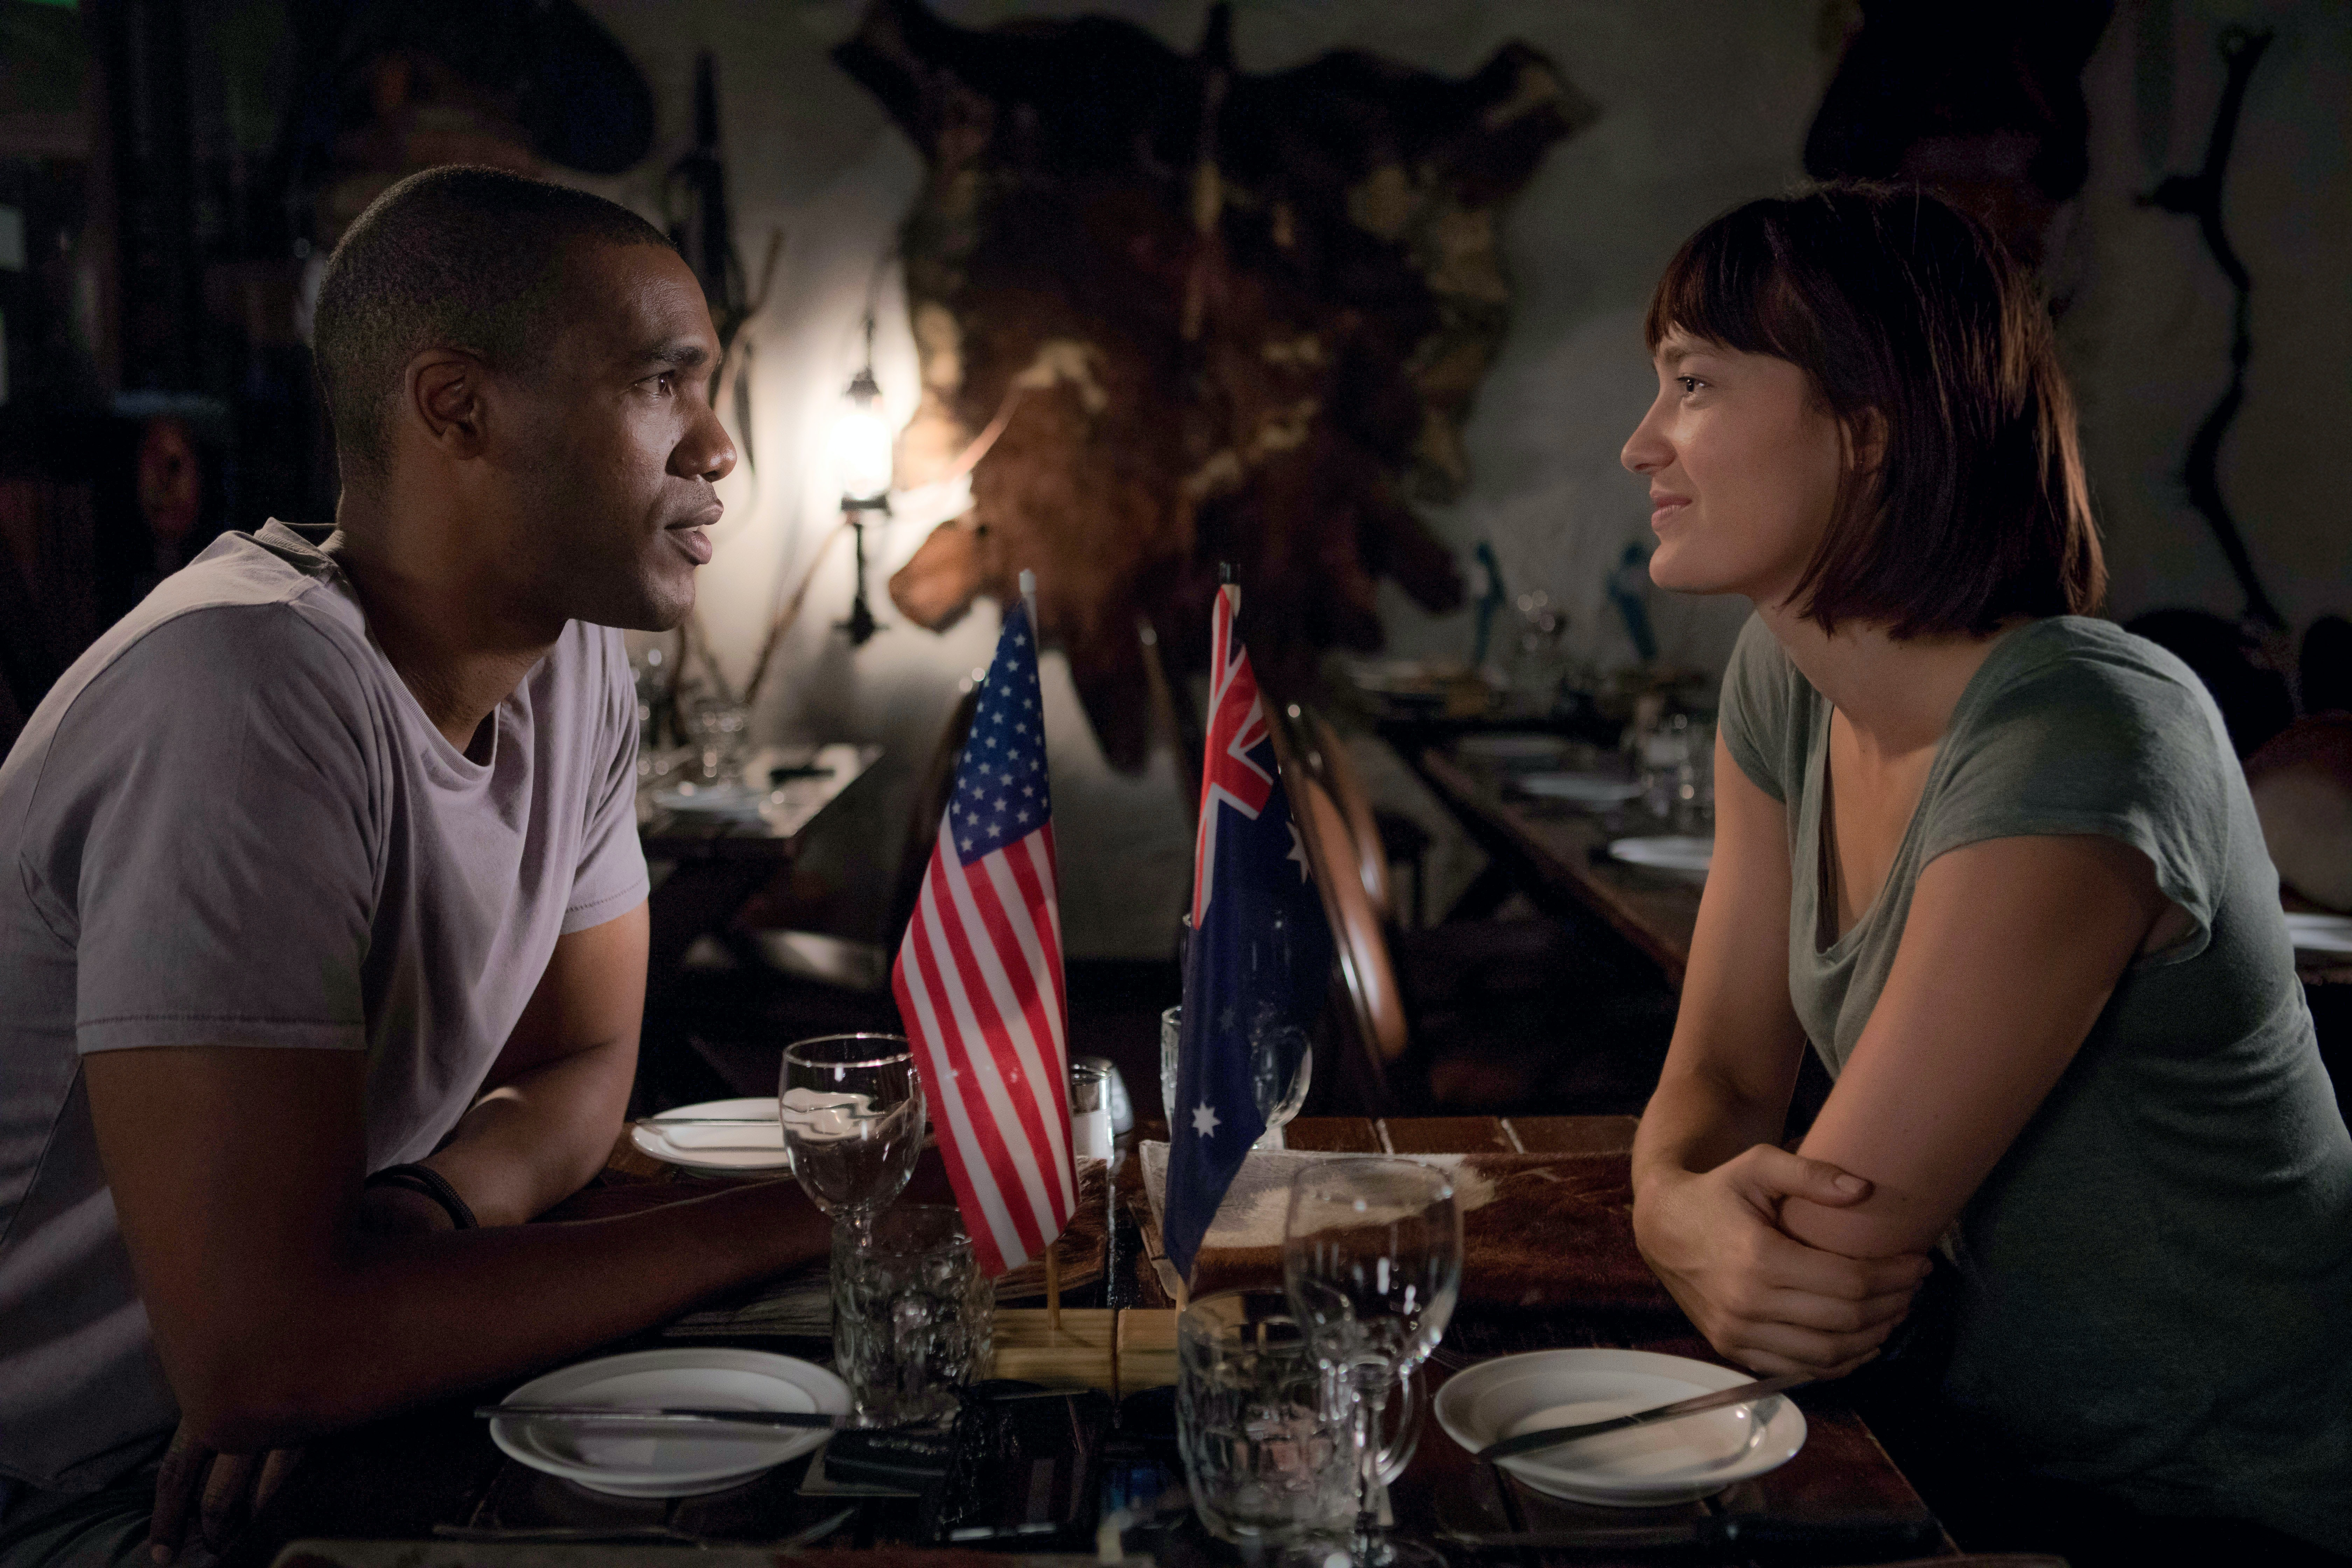 Will 'Pine Gap' Return for Season 2? The Netflix Series